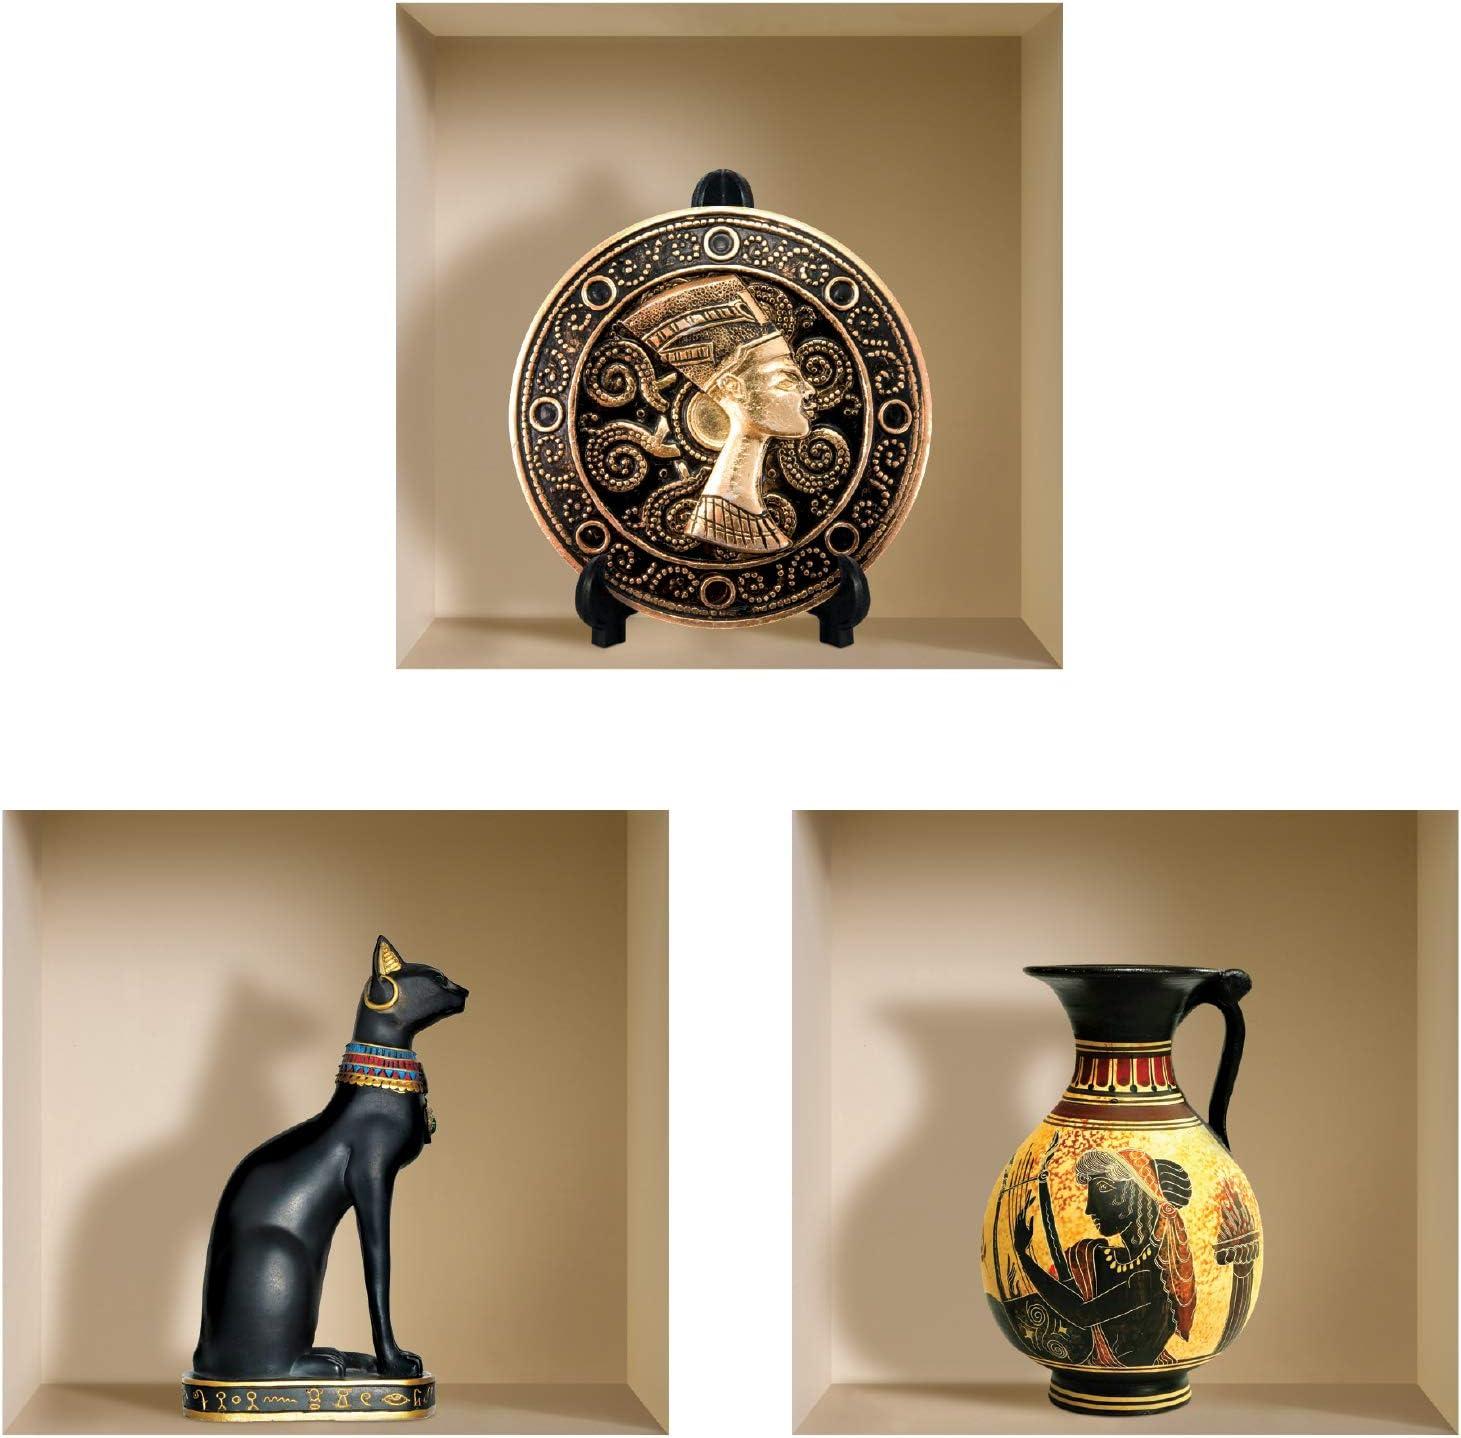 the Nisha Art Magic 3D Vinyl Removable Wall Sticker Decals DIY, Set of 3, Black Egyptian